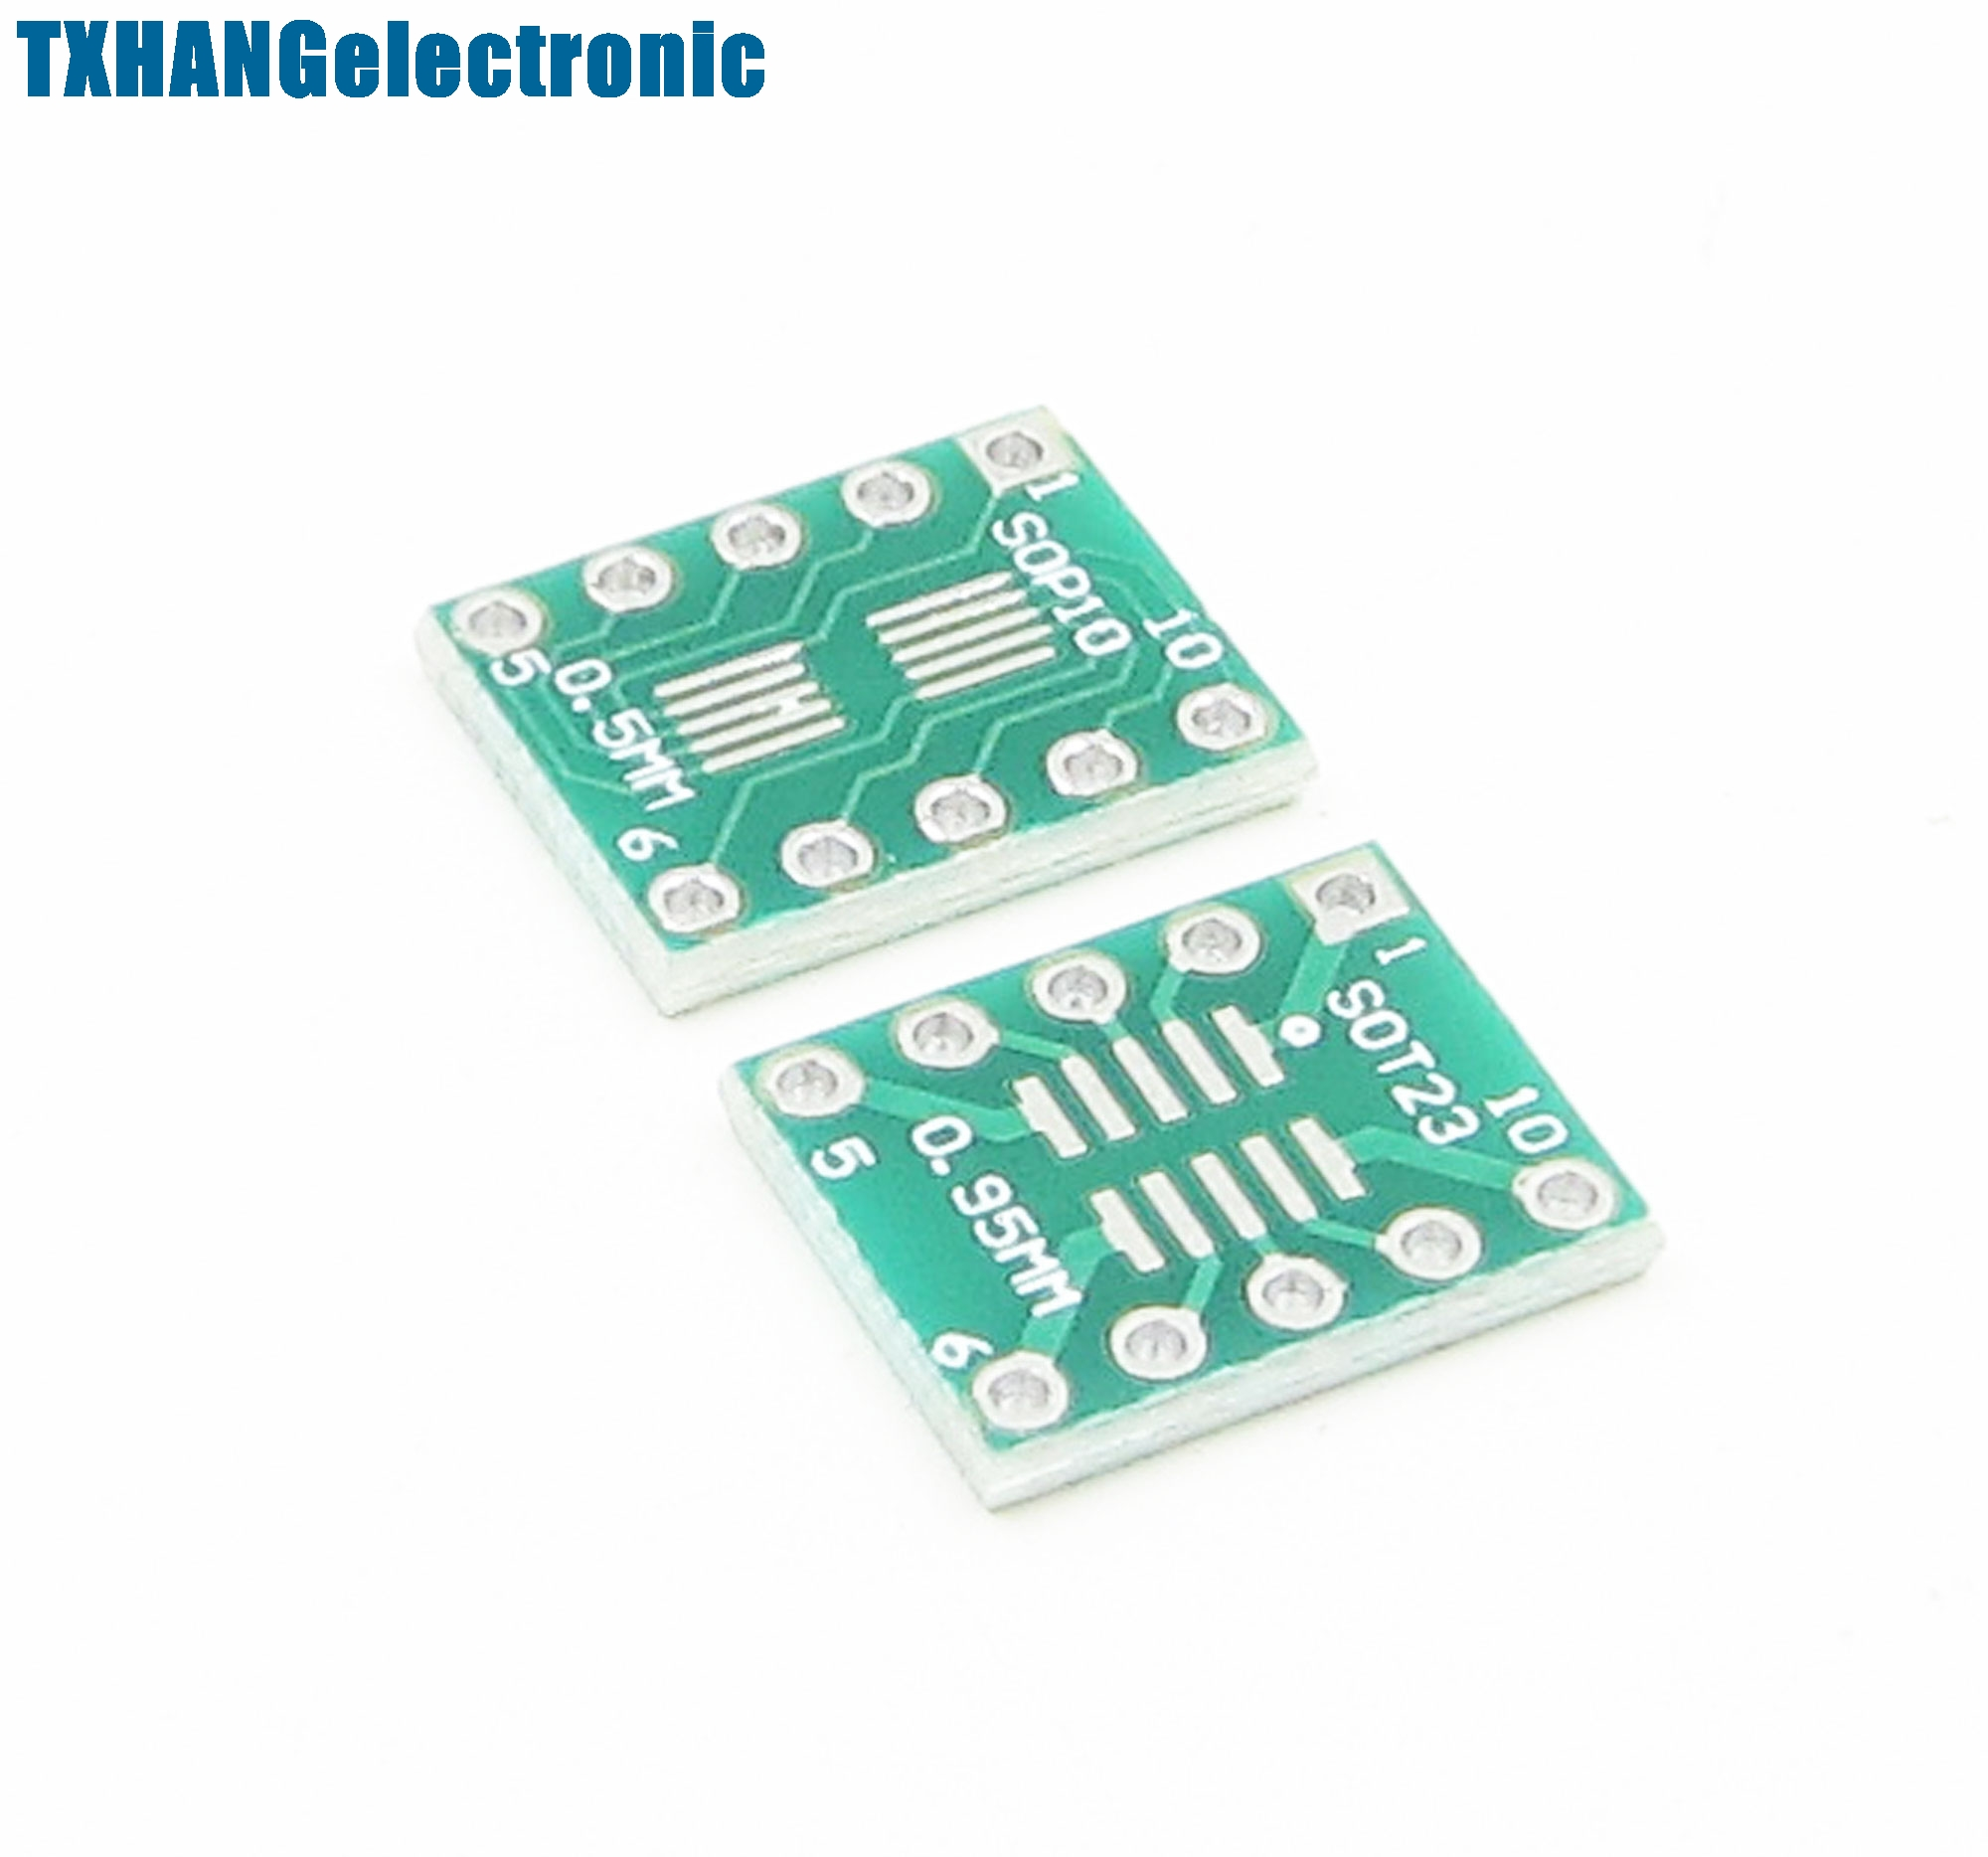 10PCS SOT23 SSOP10 MSOP10 DIP10 0.5//0.95mm Adapter Breakout PCB Converter Board